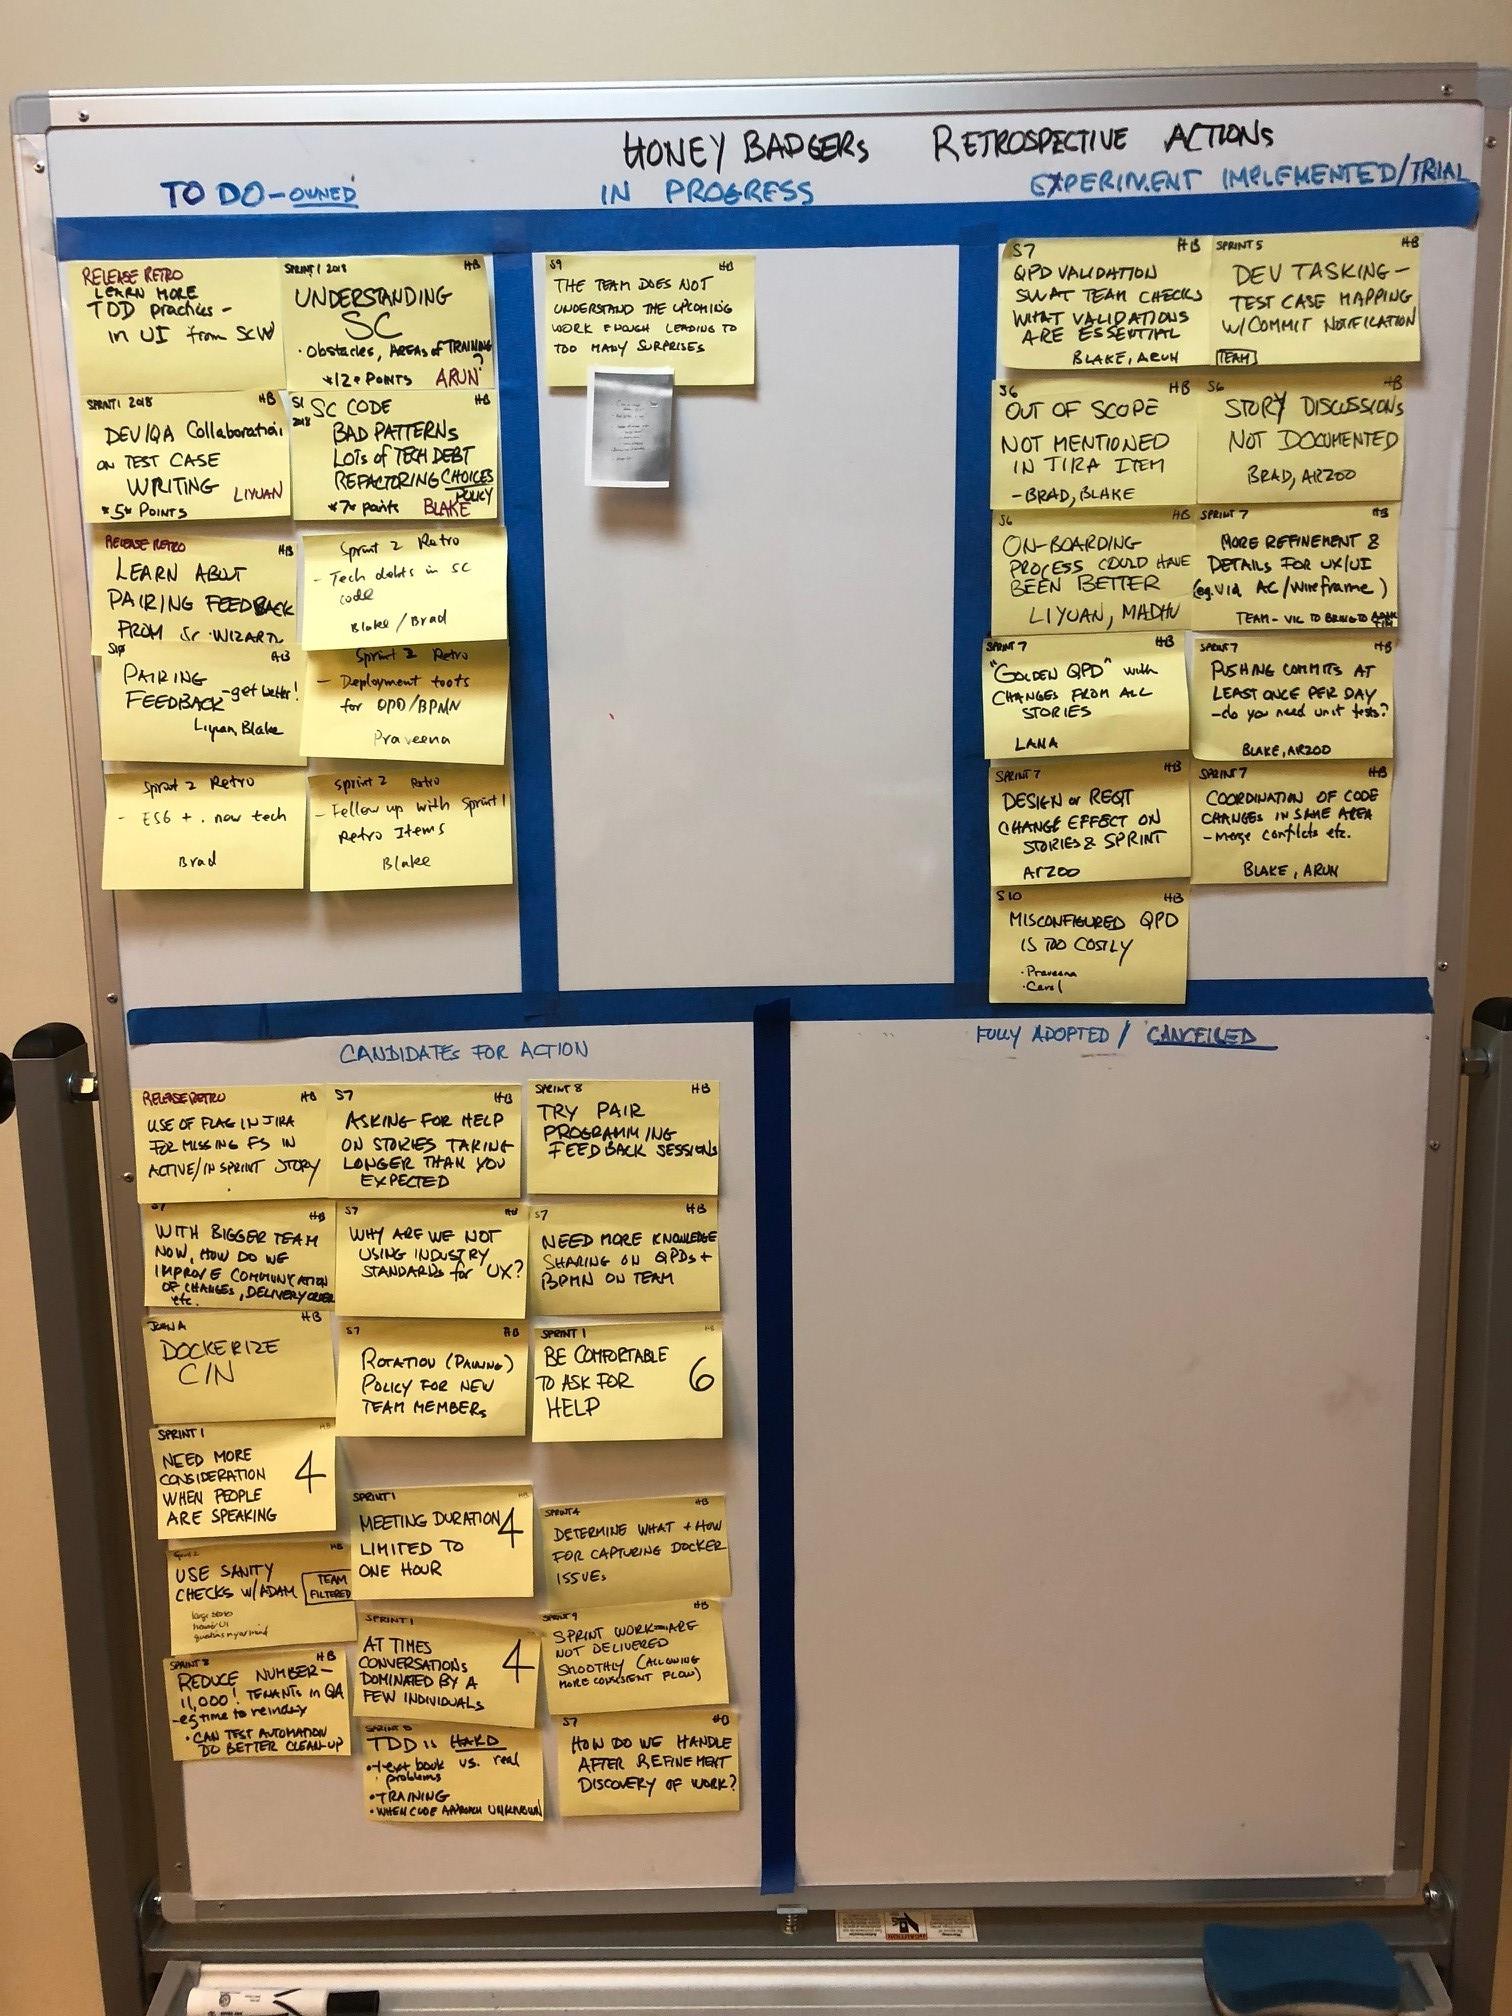 Figure 2: Retrospective Action Board